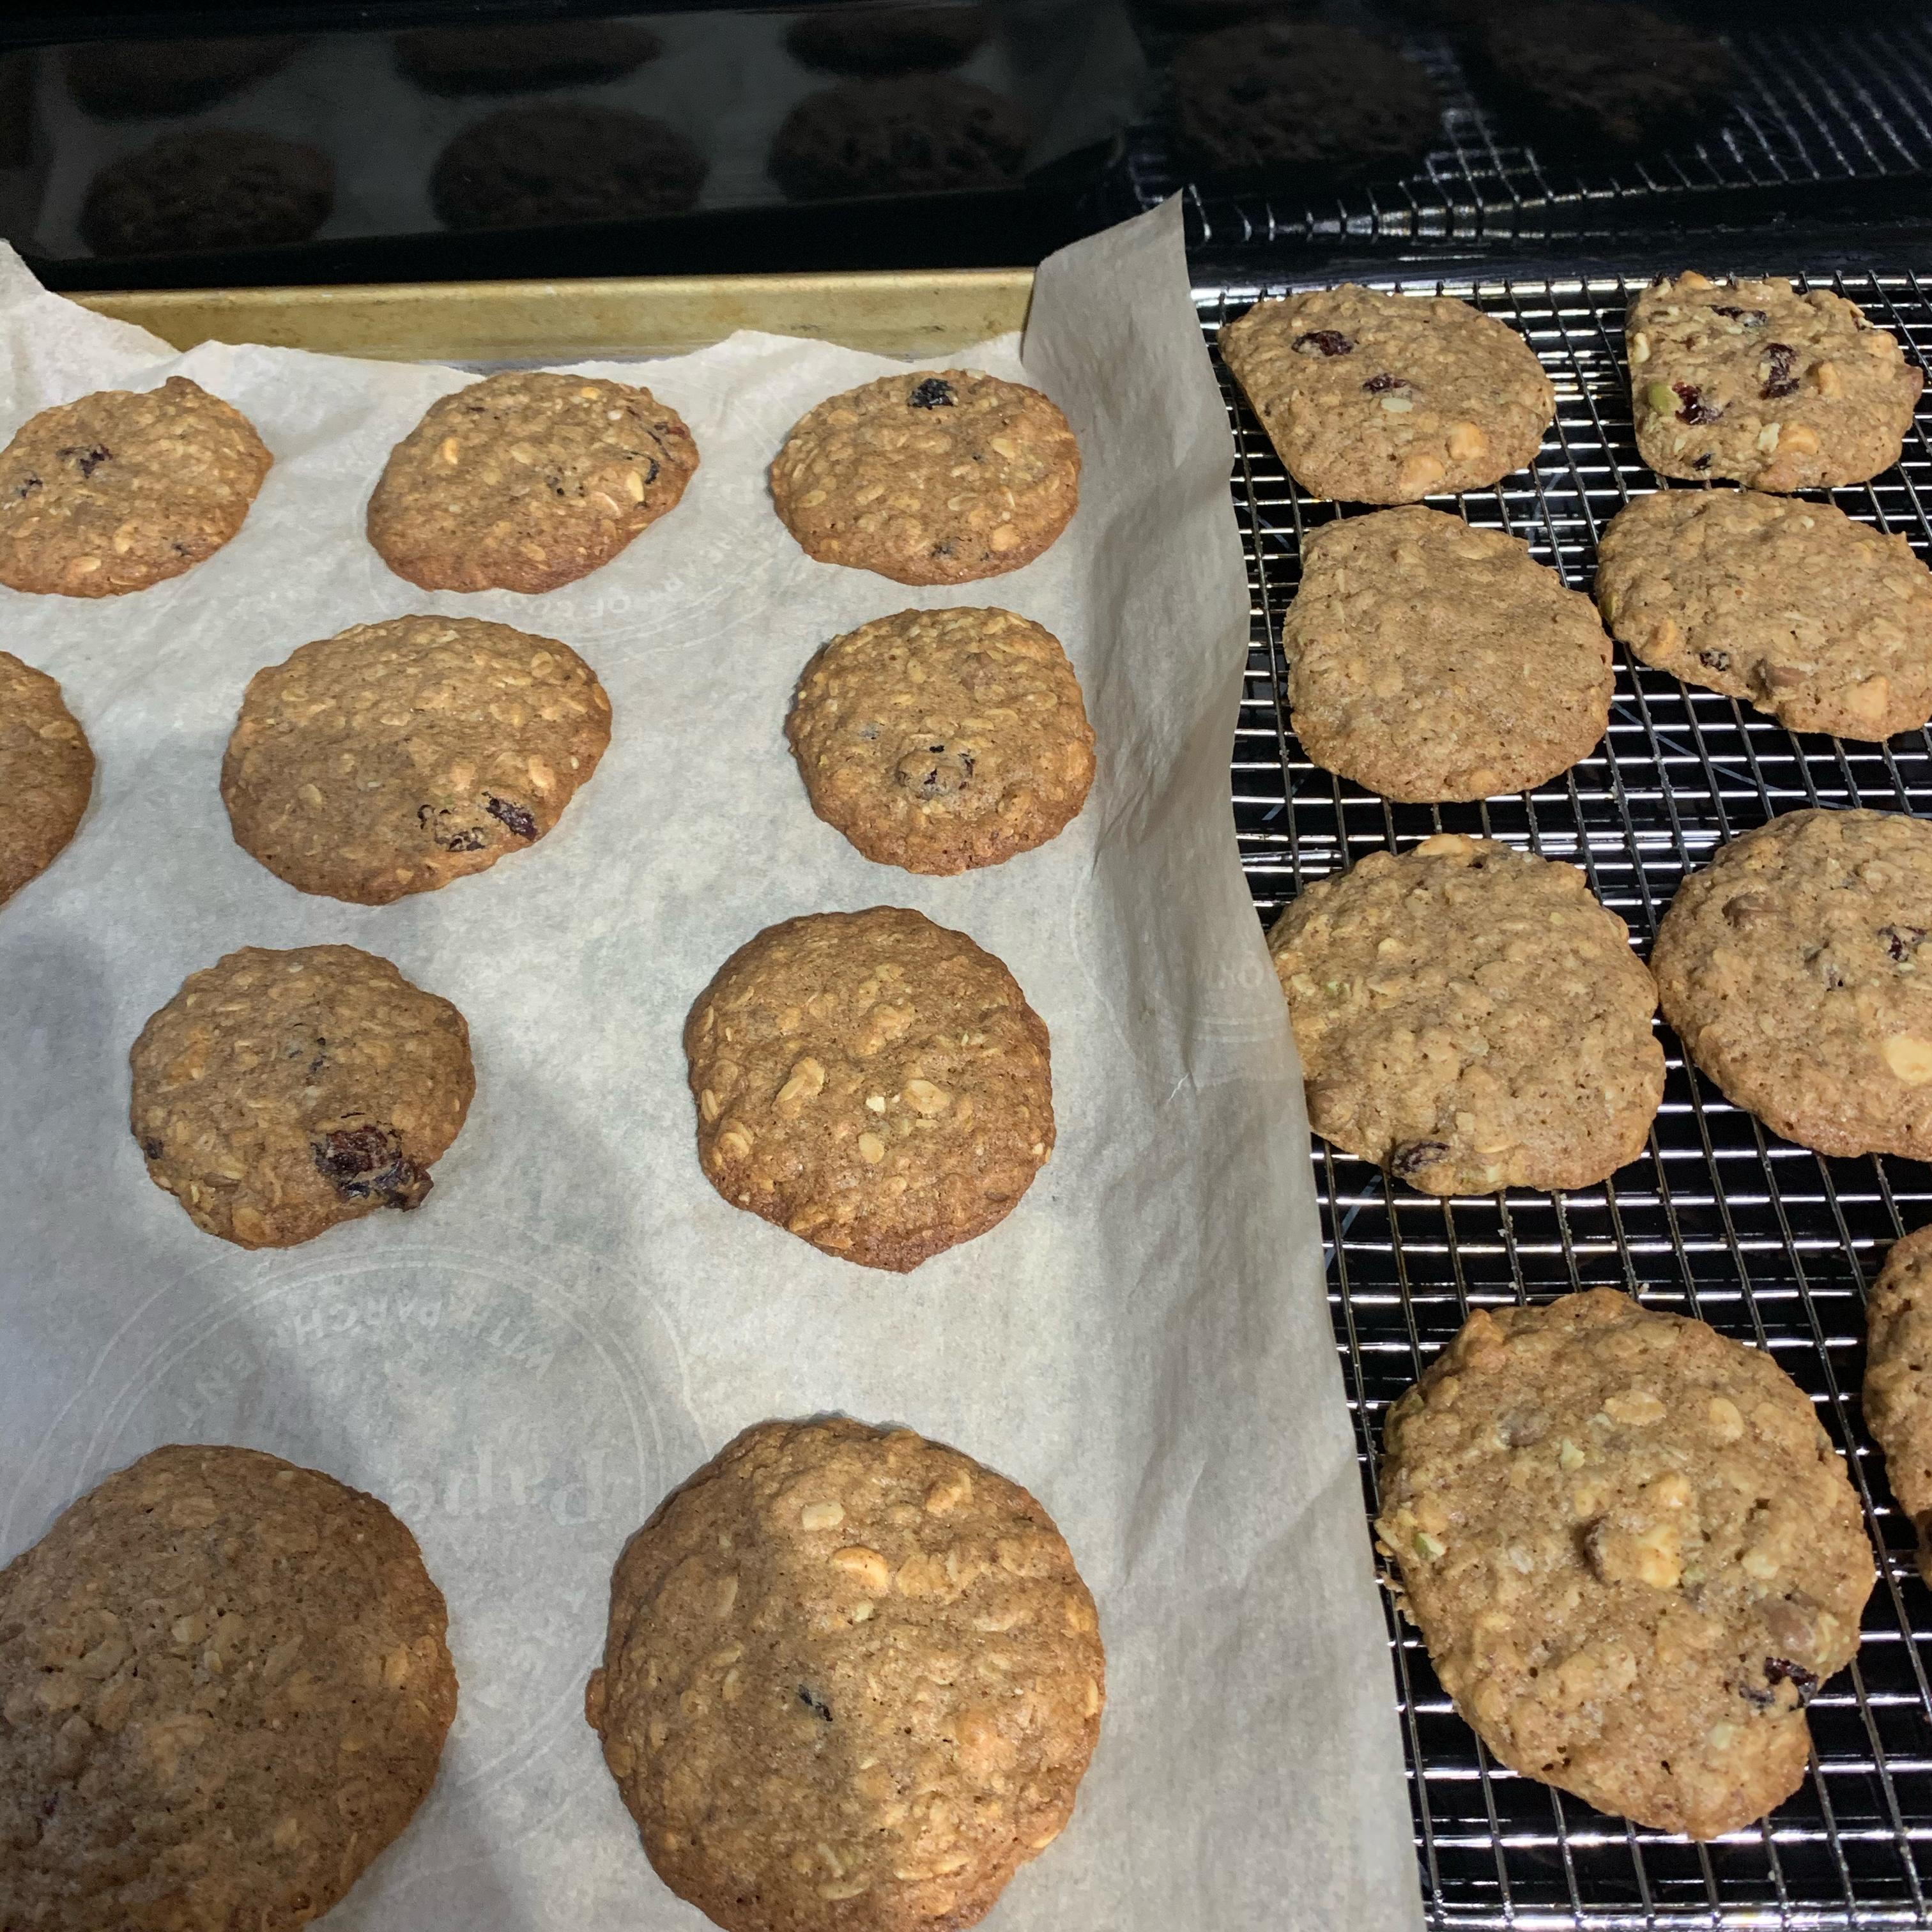 West Coast Trail Cookies